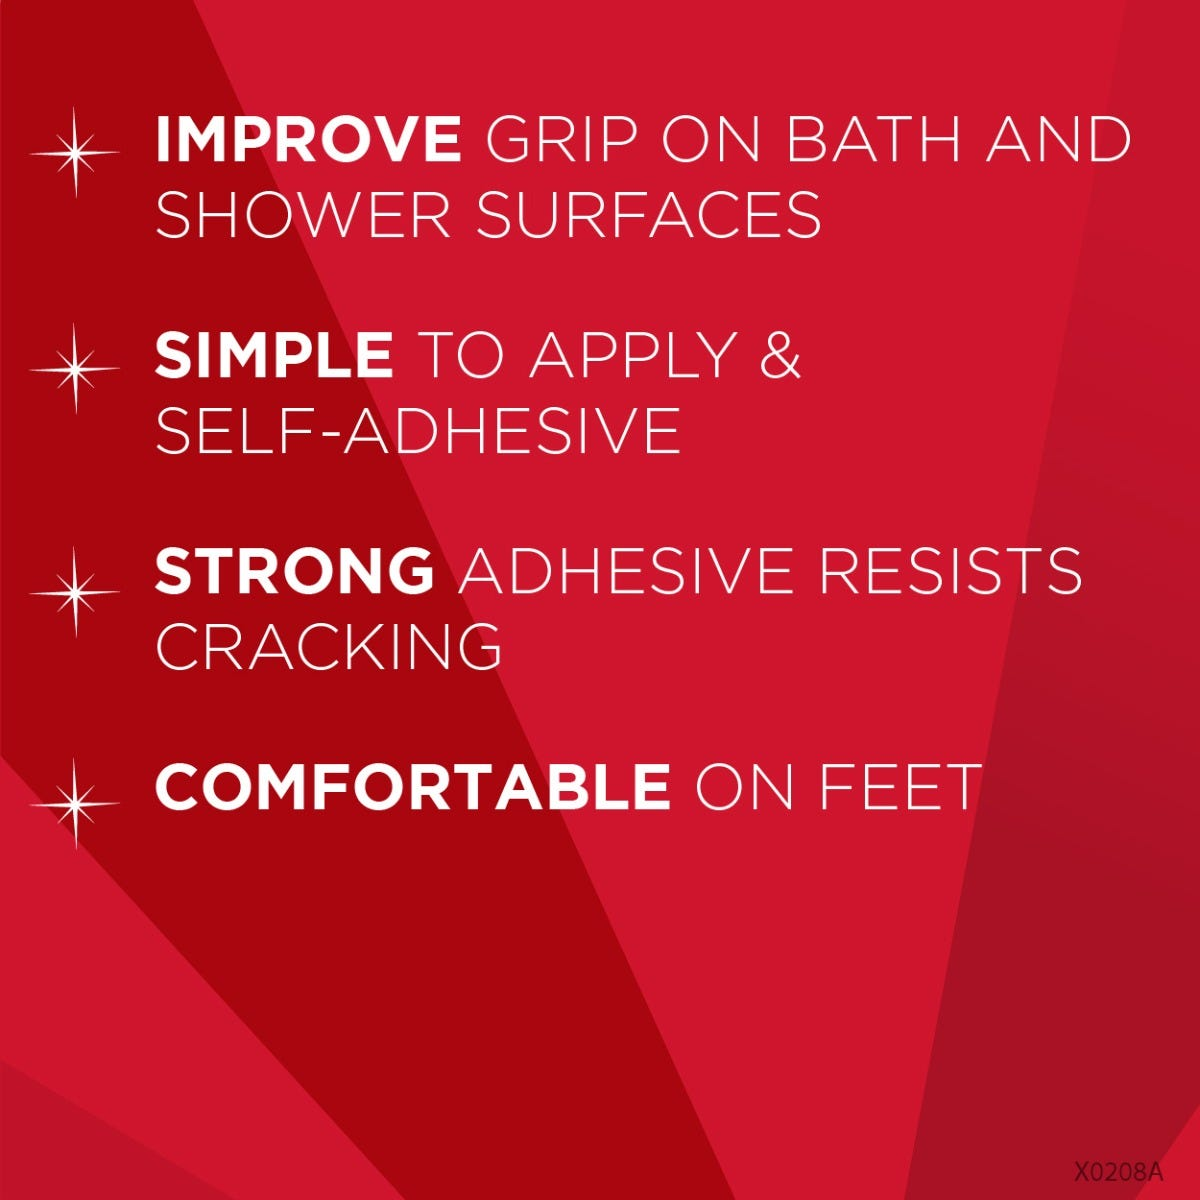 https://googone.com/media/catalog/product/s/h/shower_safety_treads_benefits.jpg